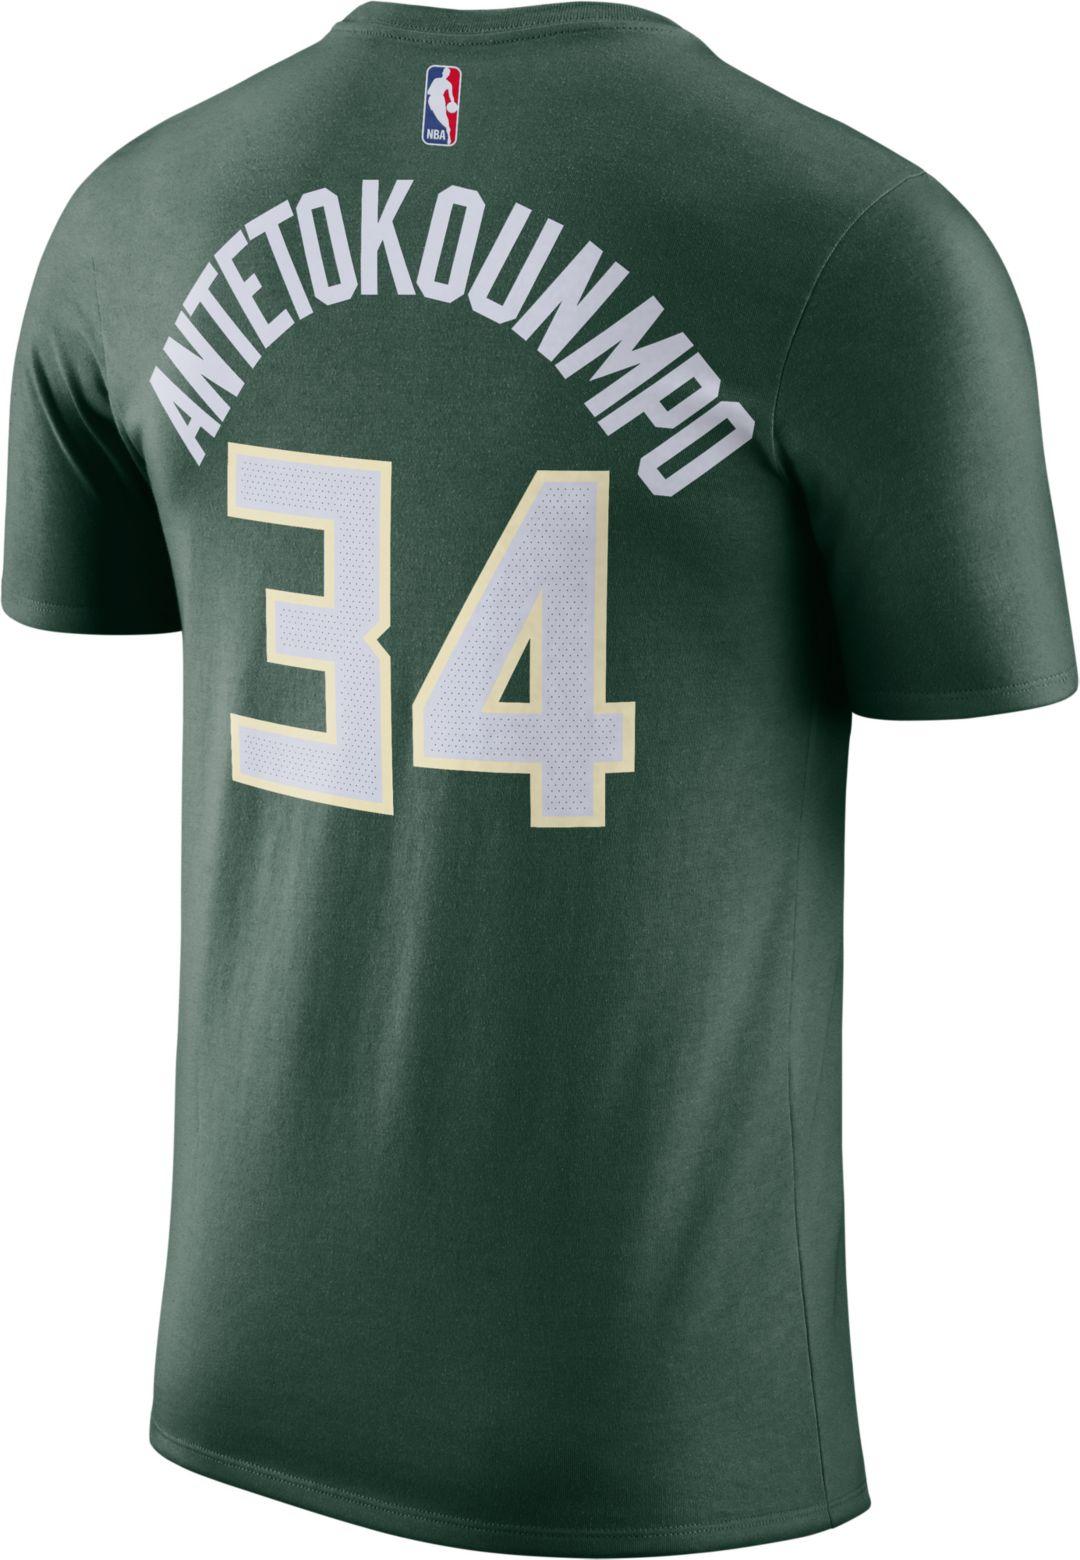 promo code 39db1 7d68f Nike Men's Milwaukee Bucks Giannis Antetokounmpo #34 Dri-FIT Green T-Shirt